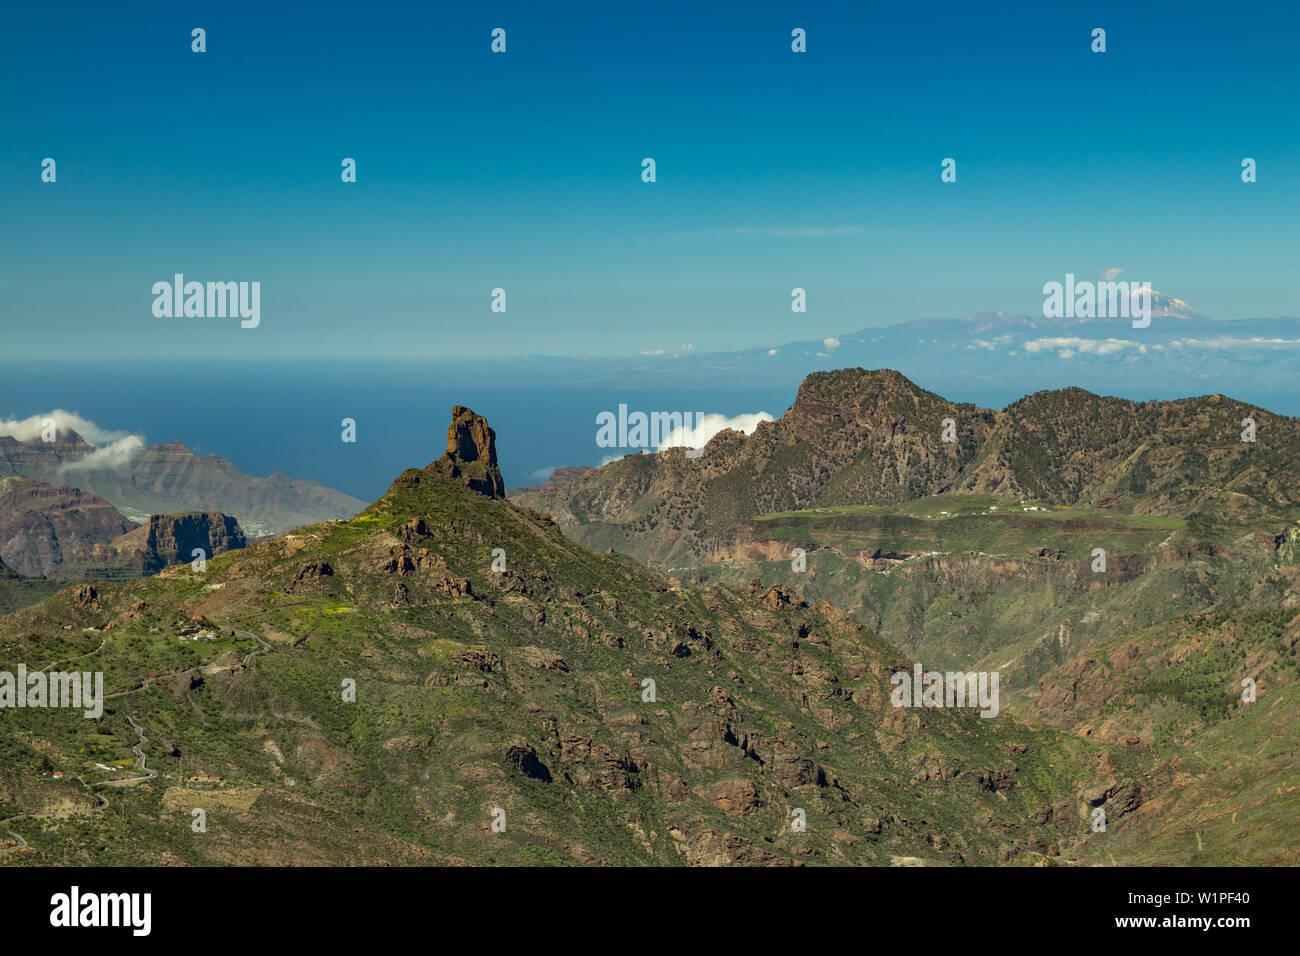 Center of Gran Canaria. Spectacular aerial view across Caldera de Tejeda towards Teide on Tenerife. Famous Roque Bentayga on average and Tenerife abov Stock Photo